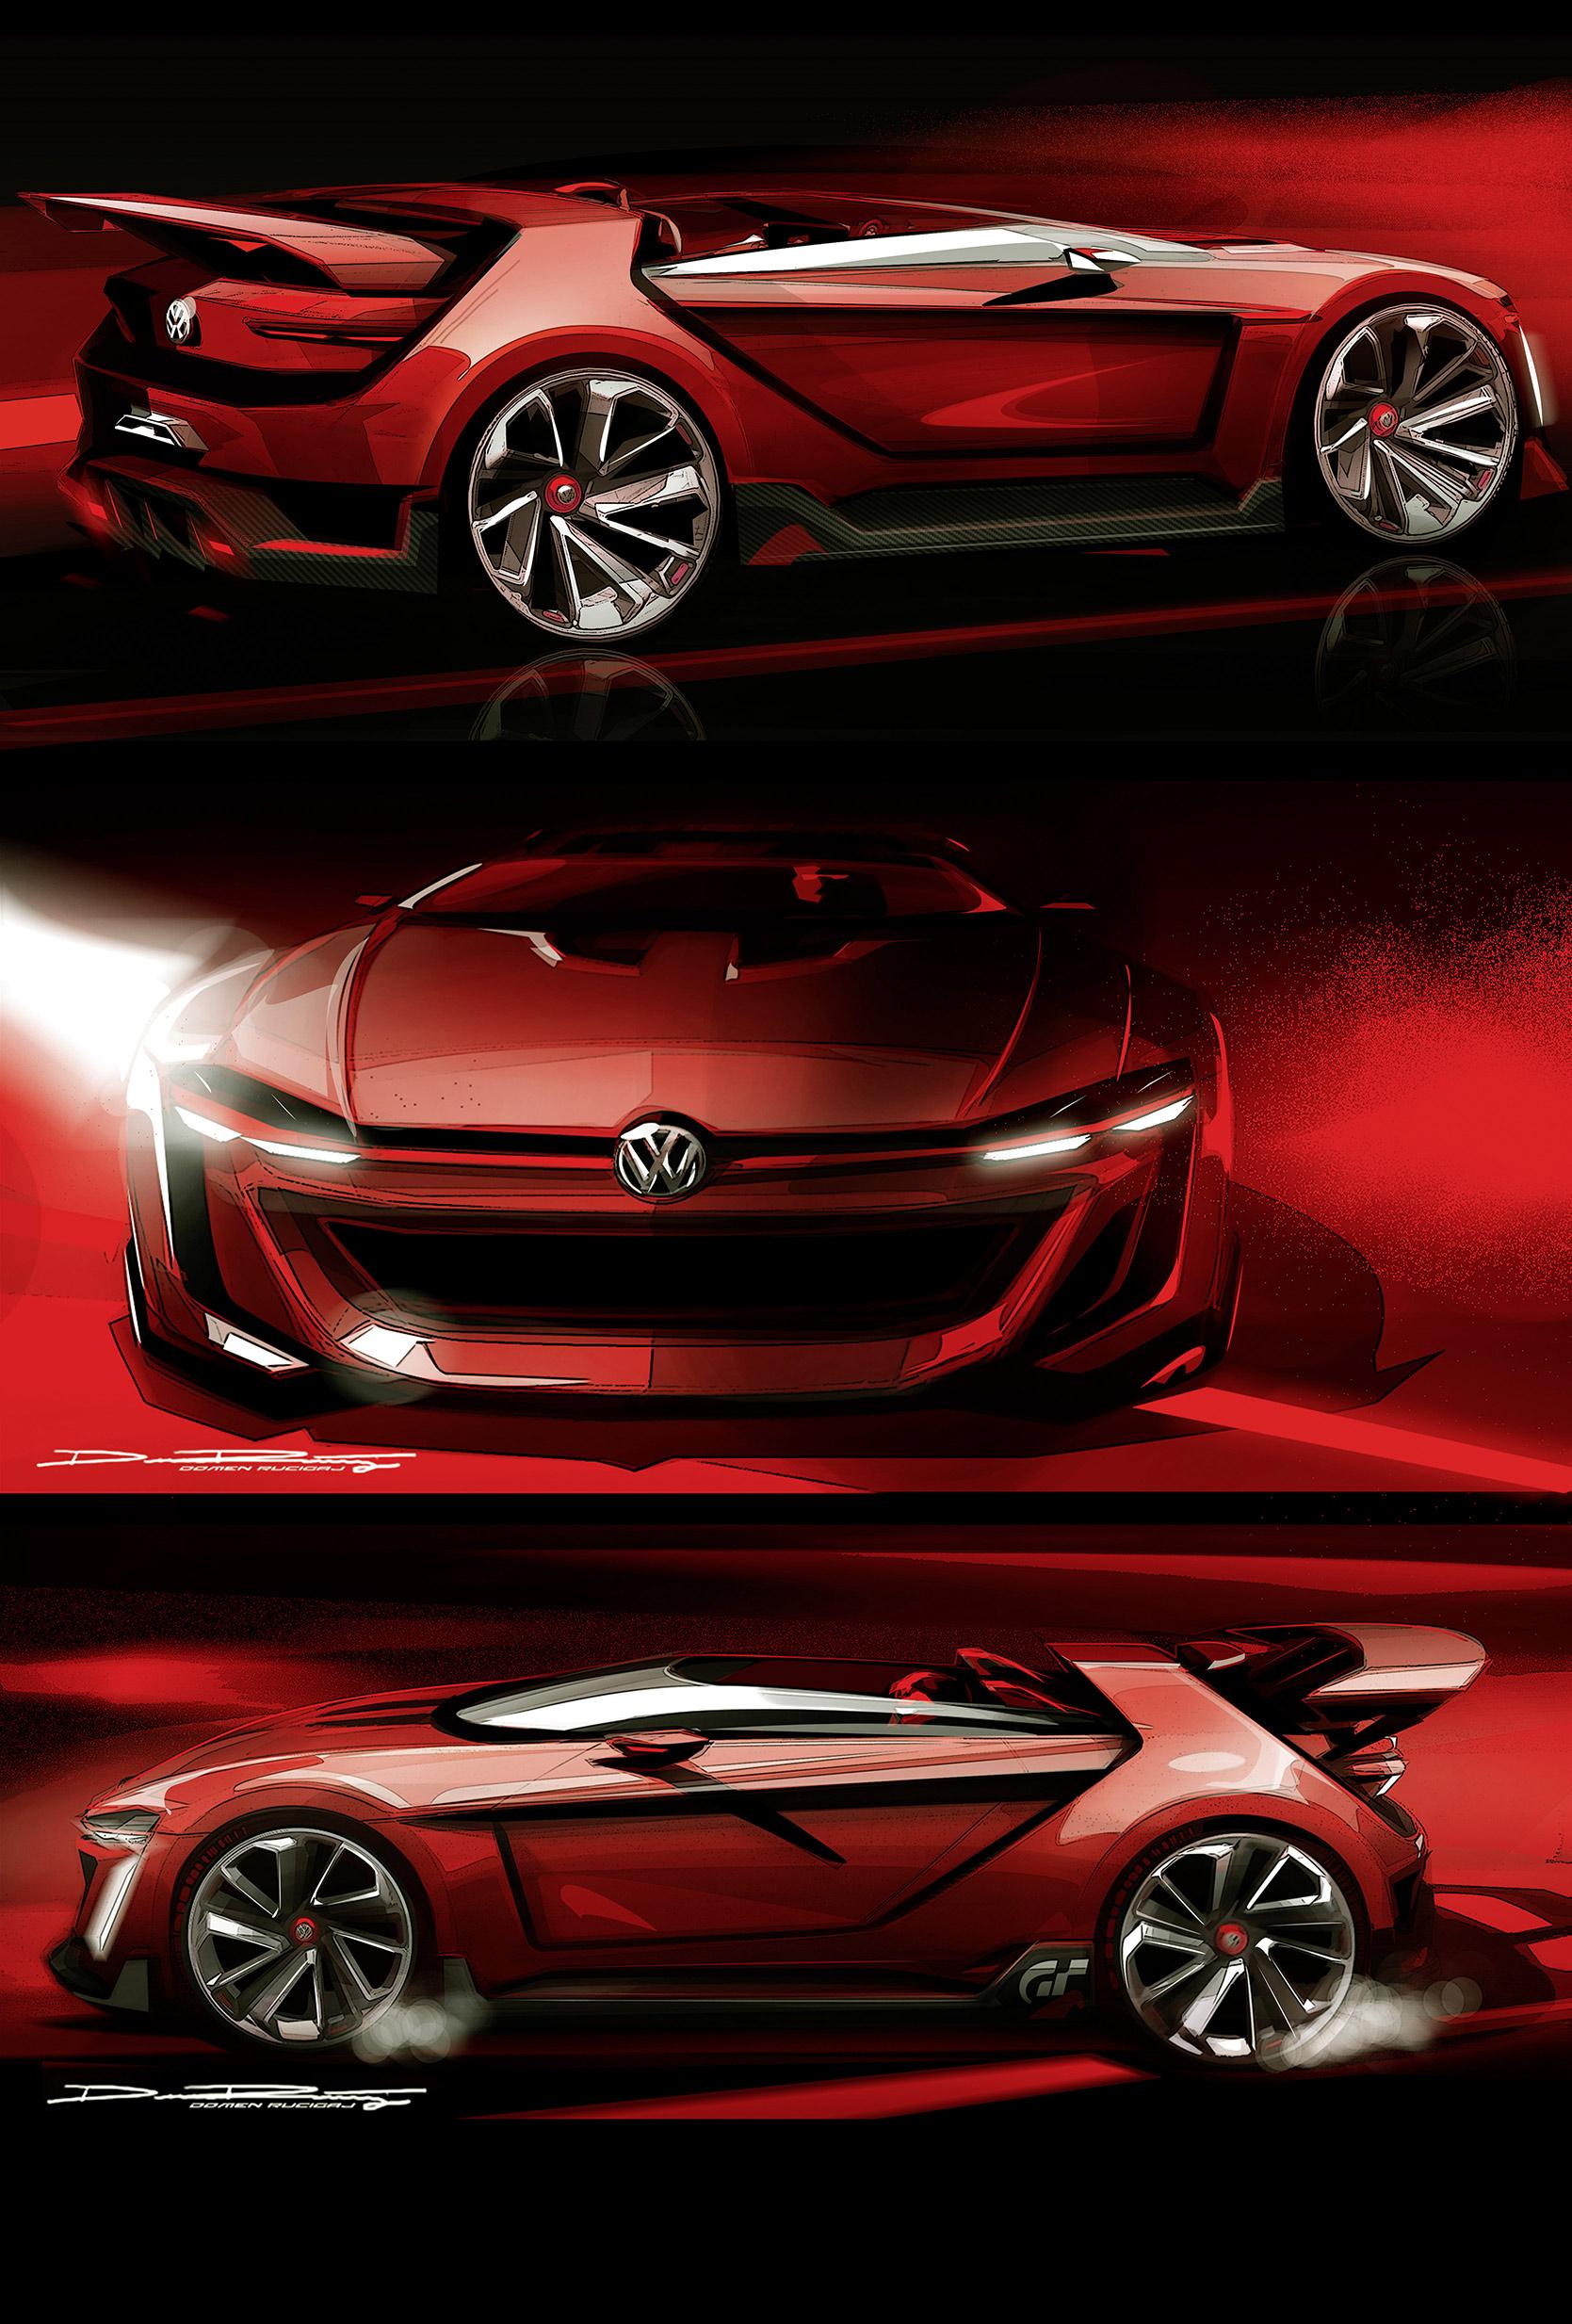 volkswagen-design-vision-gti-gran-turismo-005